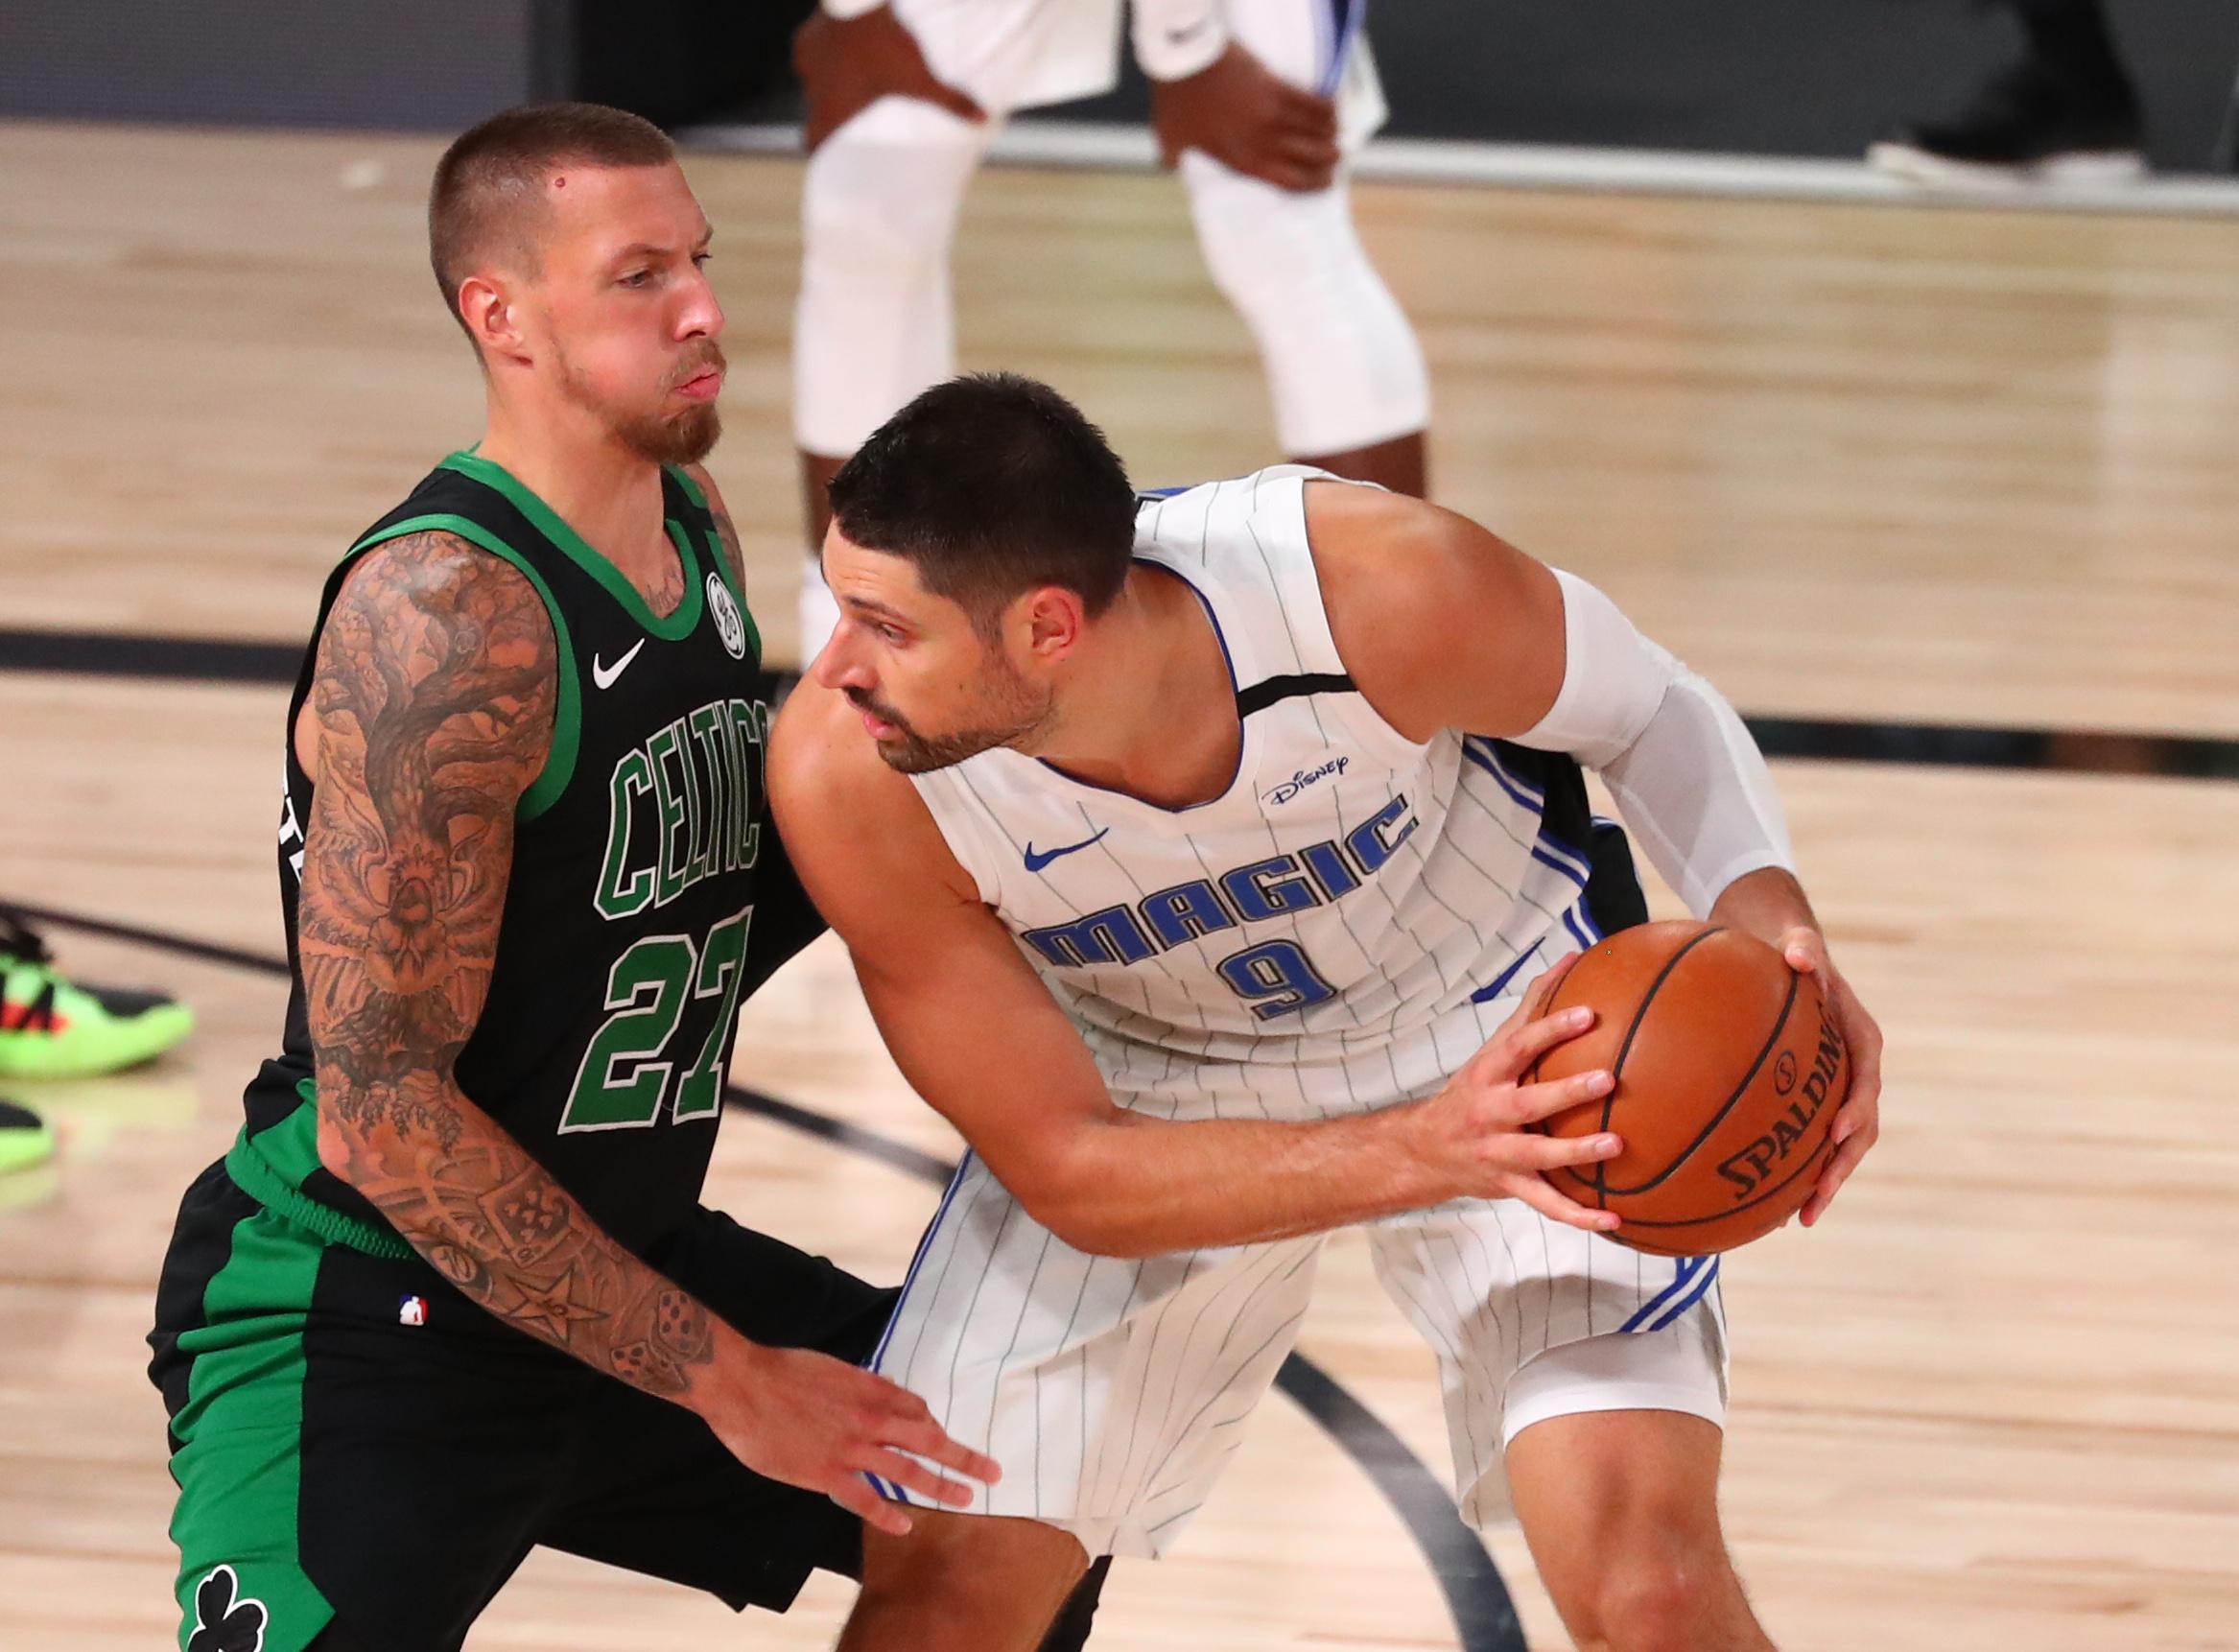 Aug 9, 2020; Lake Buena Vista, Florida, USA; Orlando Magic center Nikola Vucevic (9) controls the ball against Boston Celtics center Daniel Theis (27) during the first half of a NBA basketball game at AdventHealth Arena.